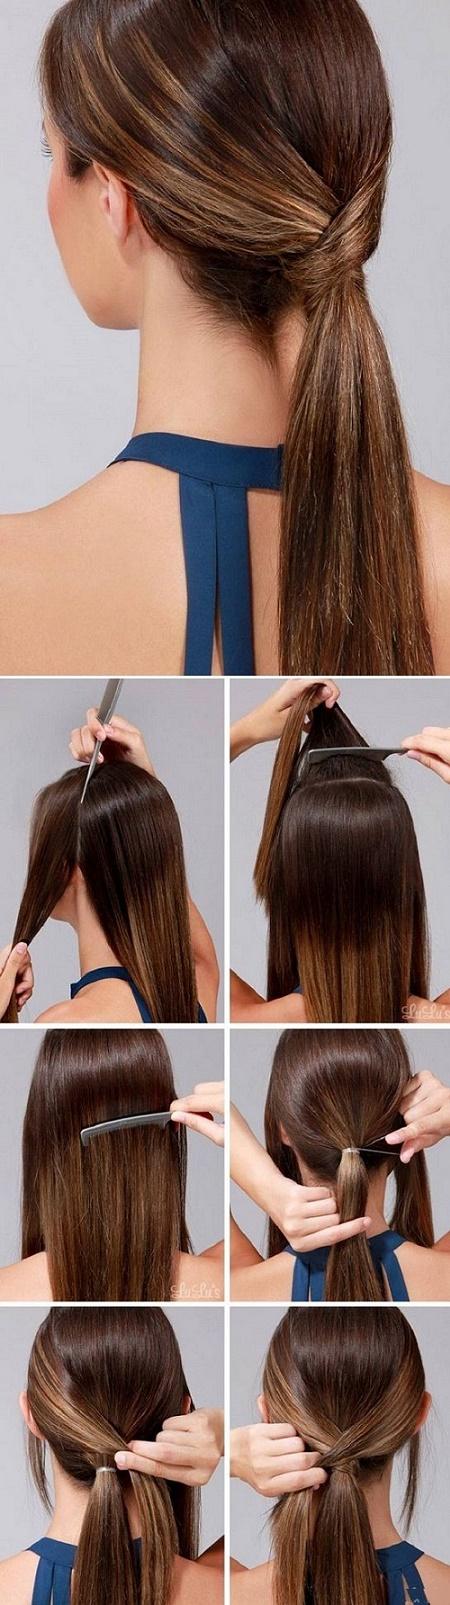 Peinados para bodas ideales para invitadas - Como hacer peinado para boda ...